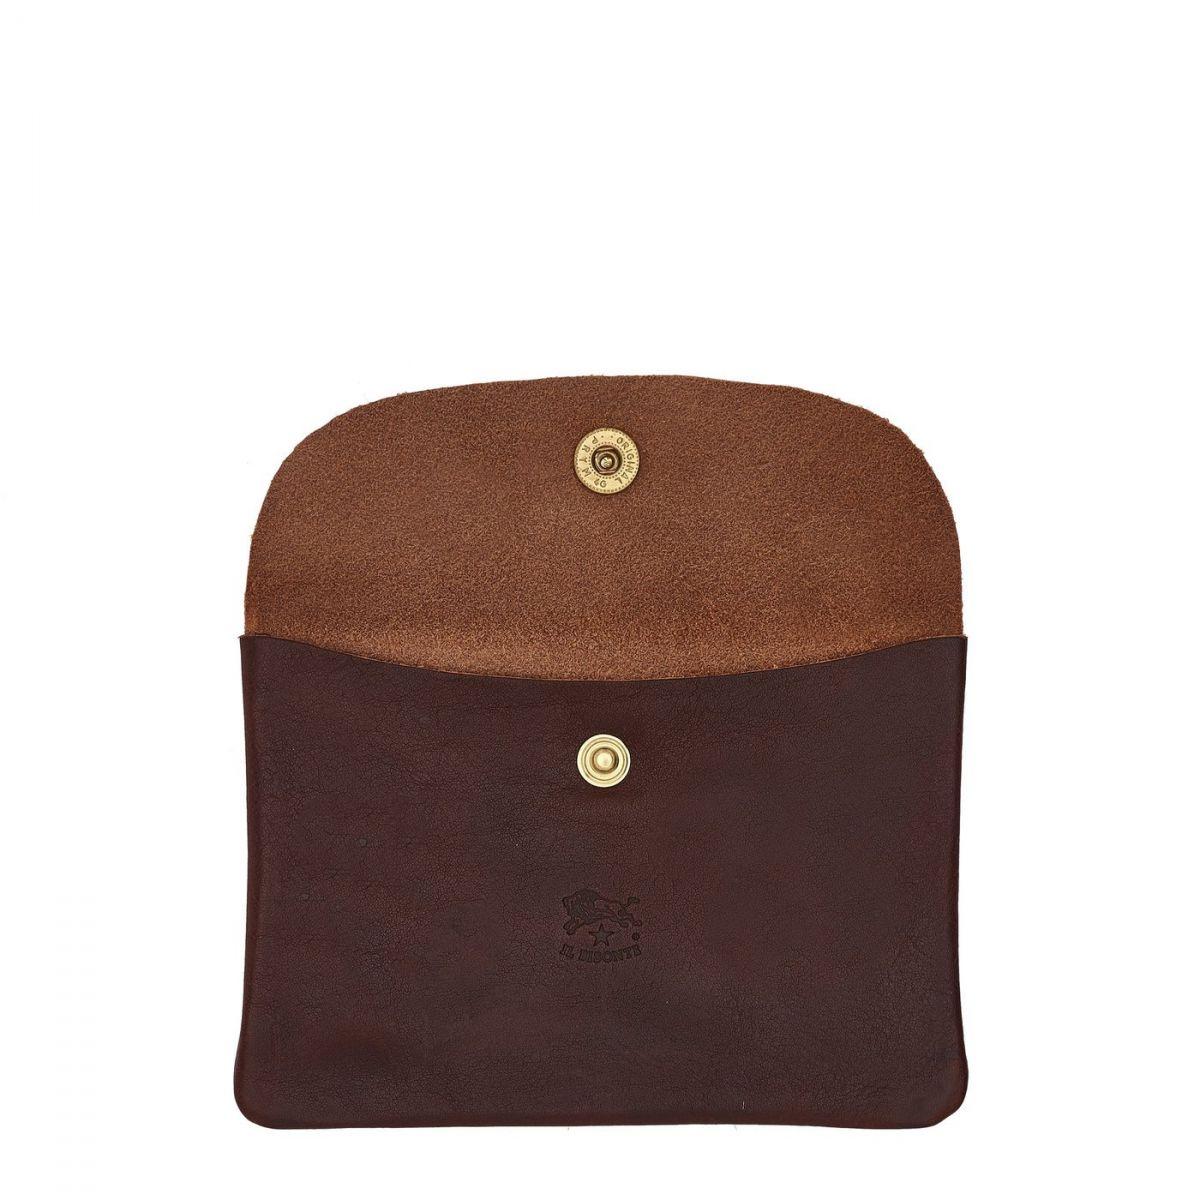 Case in Vintage Cowhide Leather SCA008 color Dark Brown | Details